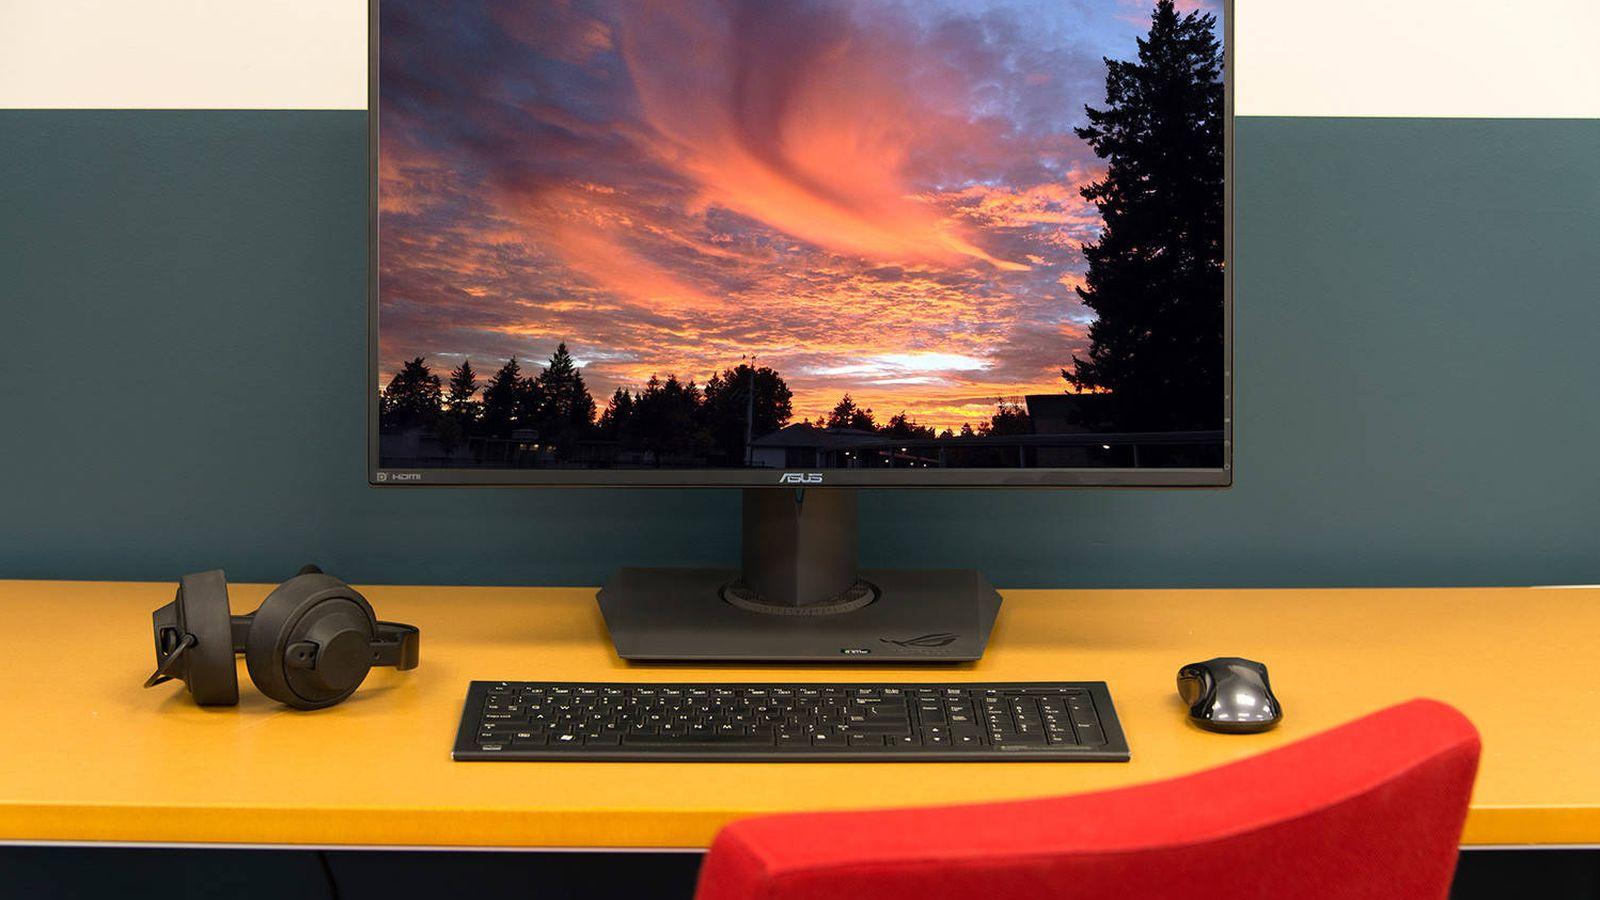 Trucos: Todo lo que debes saber antes de comprar un monitor para tu ...